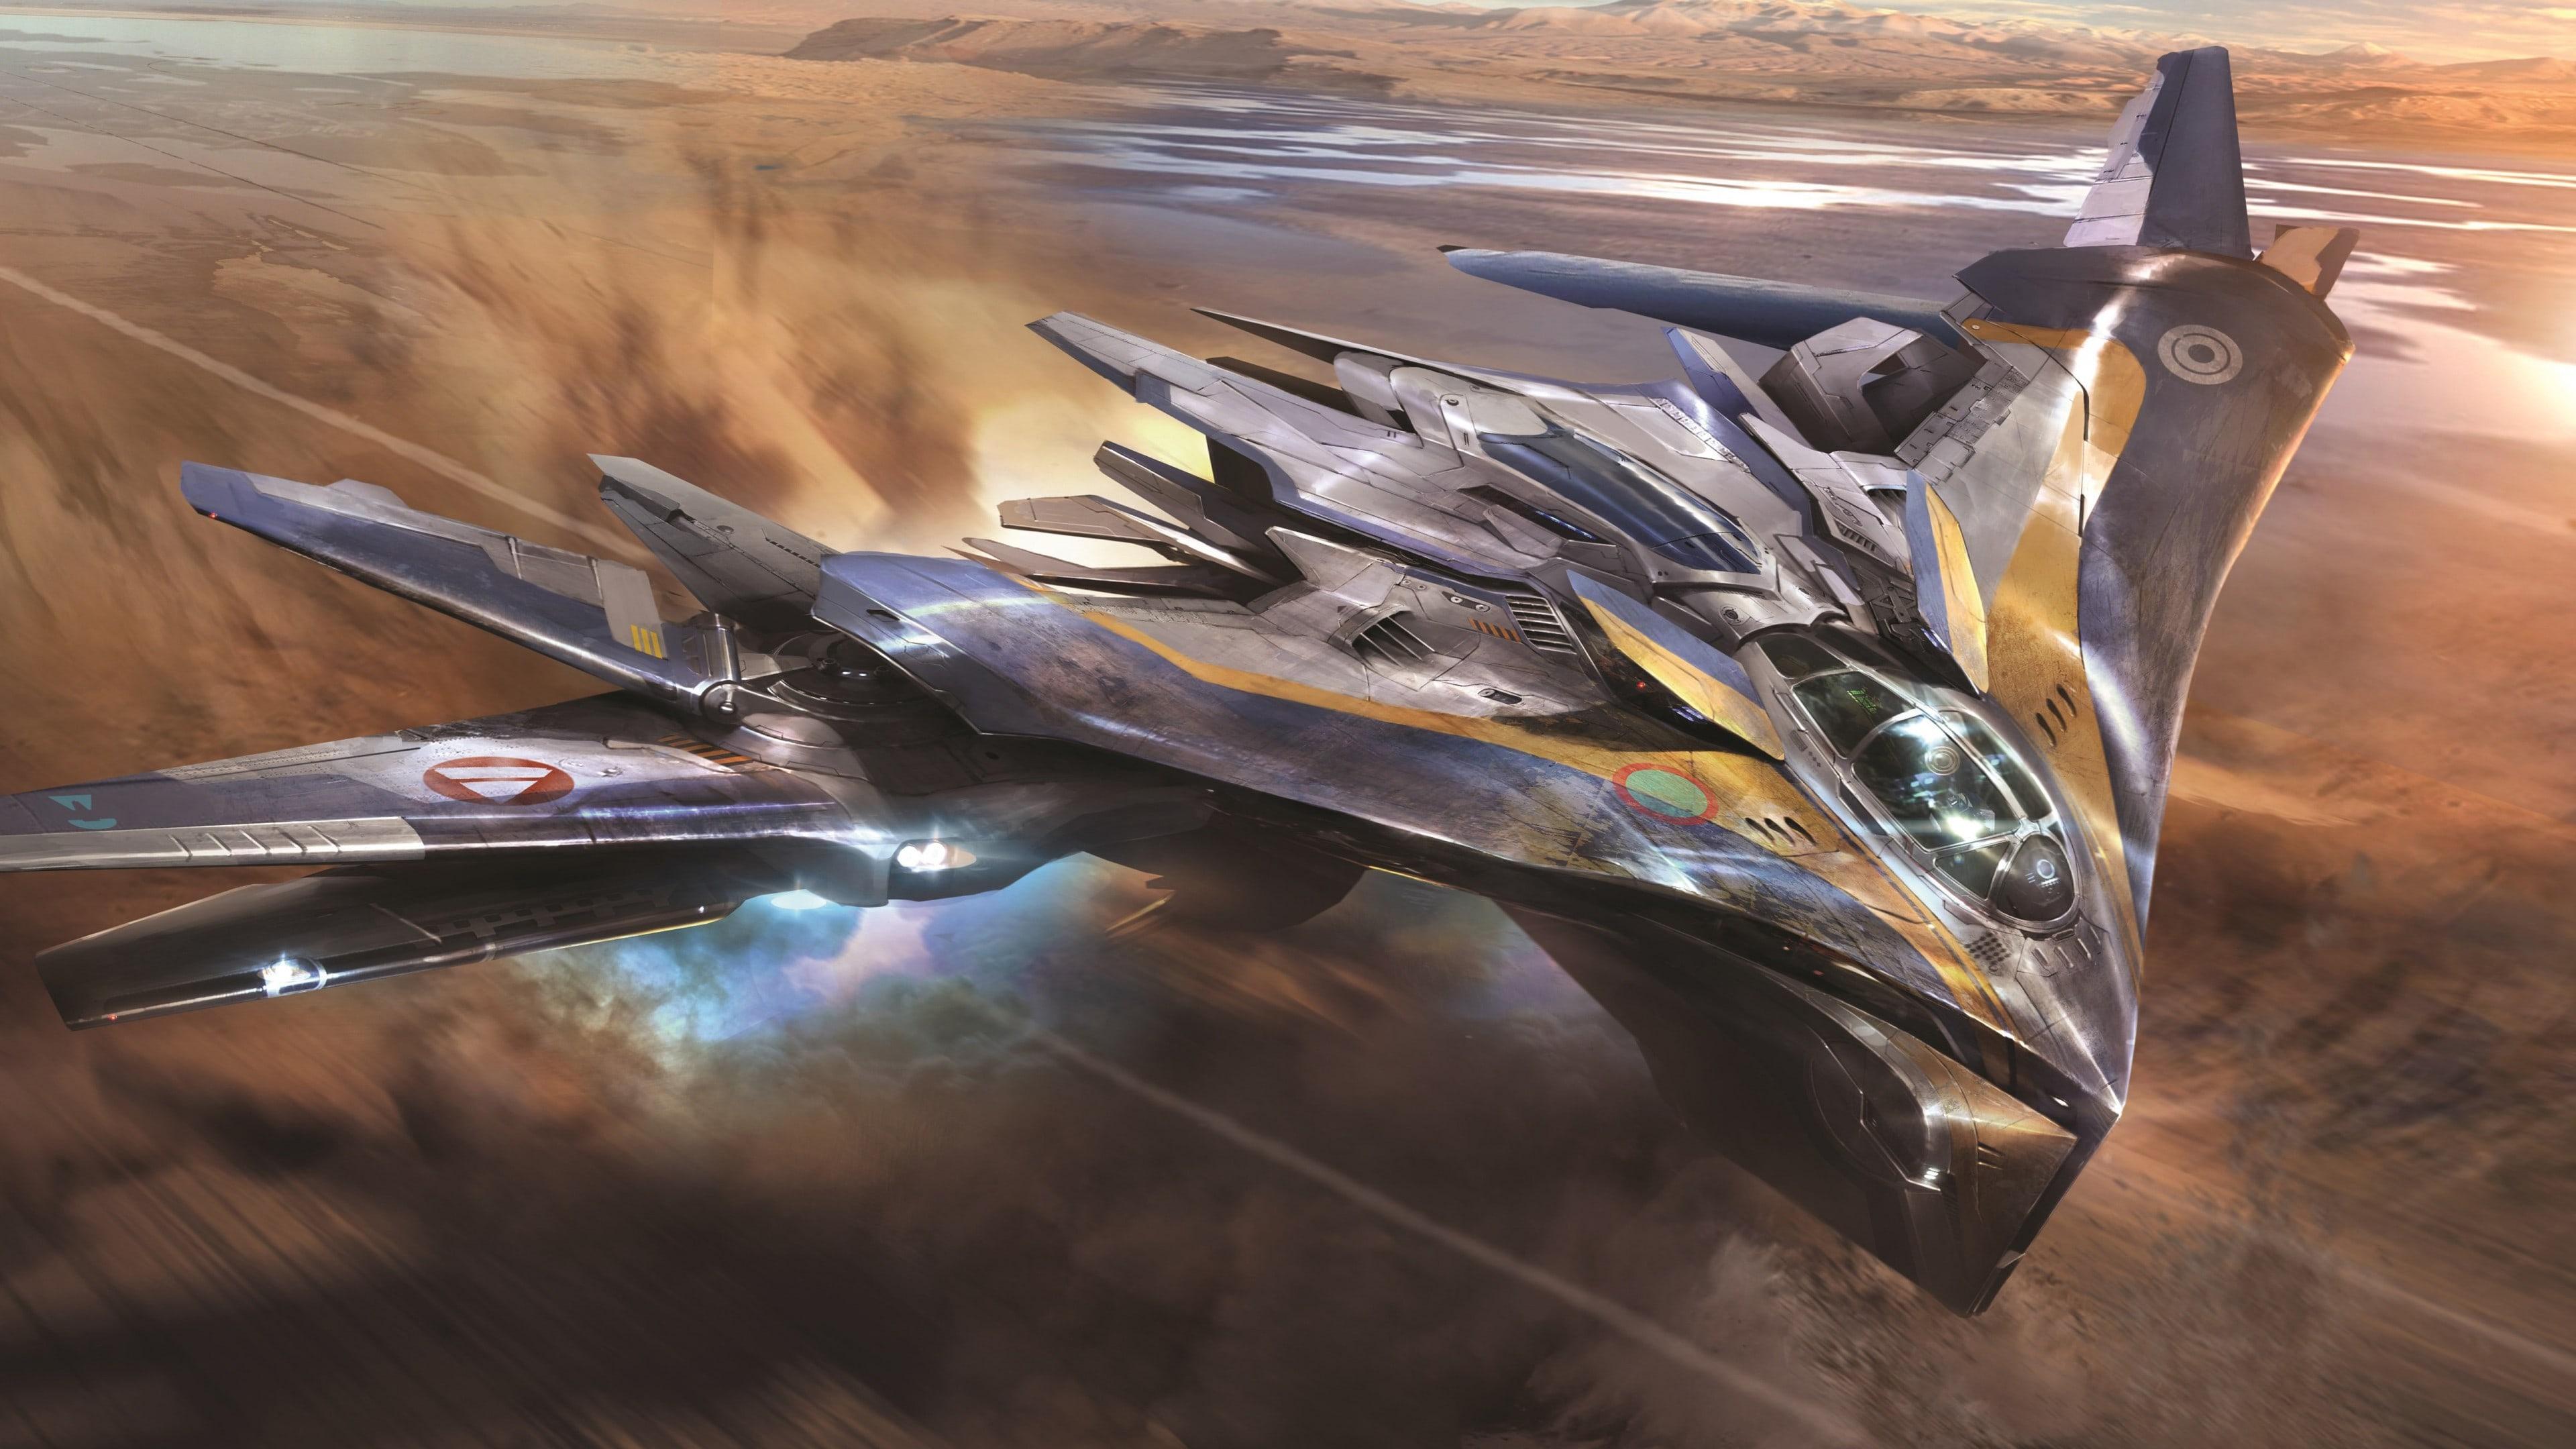 download milano spaceship guardians galaxy 1191 Wallpapers 3840x2160